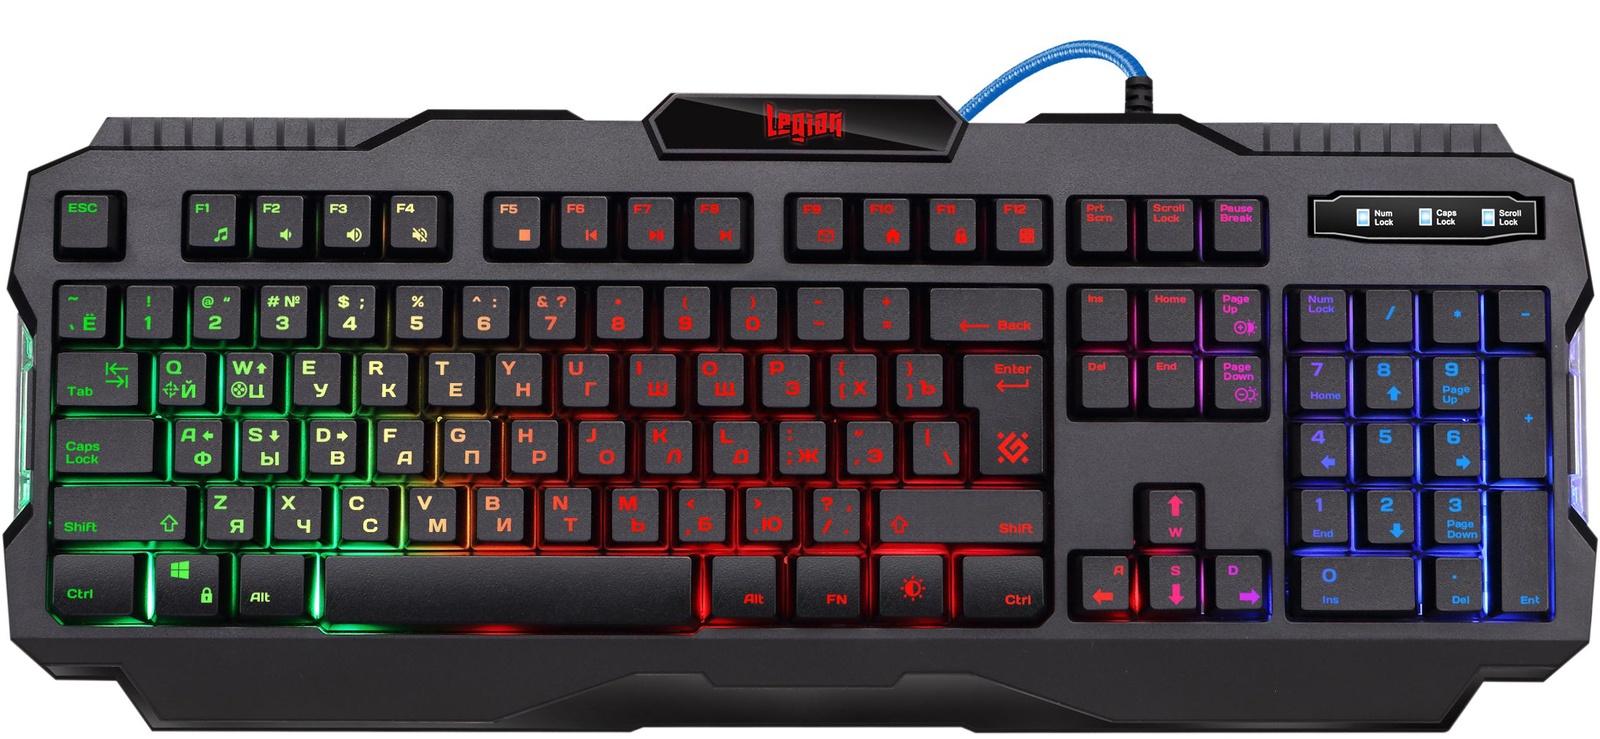 Проводная игровая клавиатура Defender Legion GK-010DL RU,RGB подсветка,19 Anti-Ghost